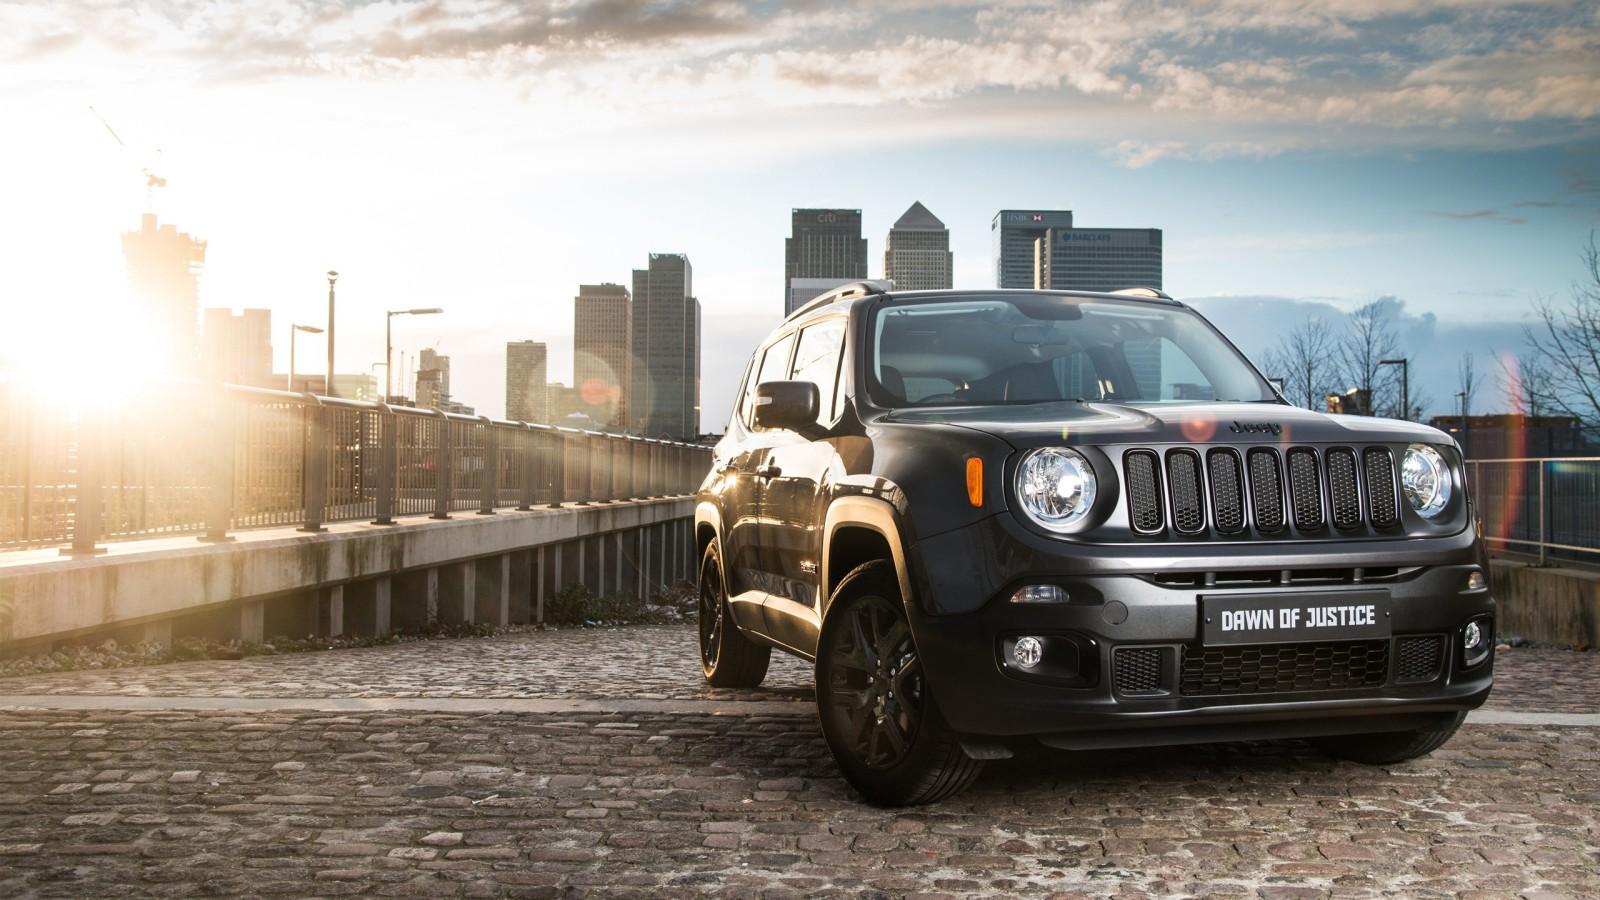 jeep renegade dawn of justice edition wallpaper hd car